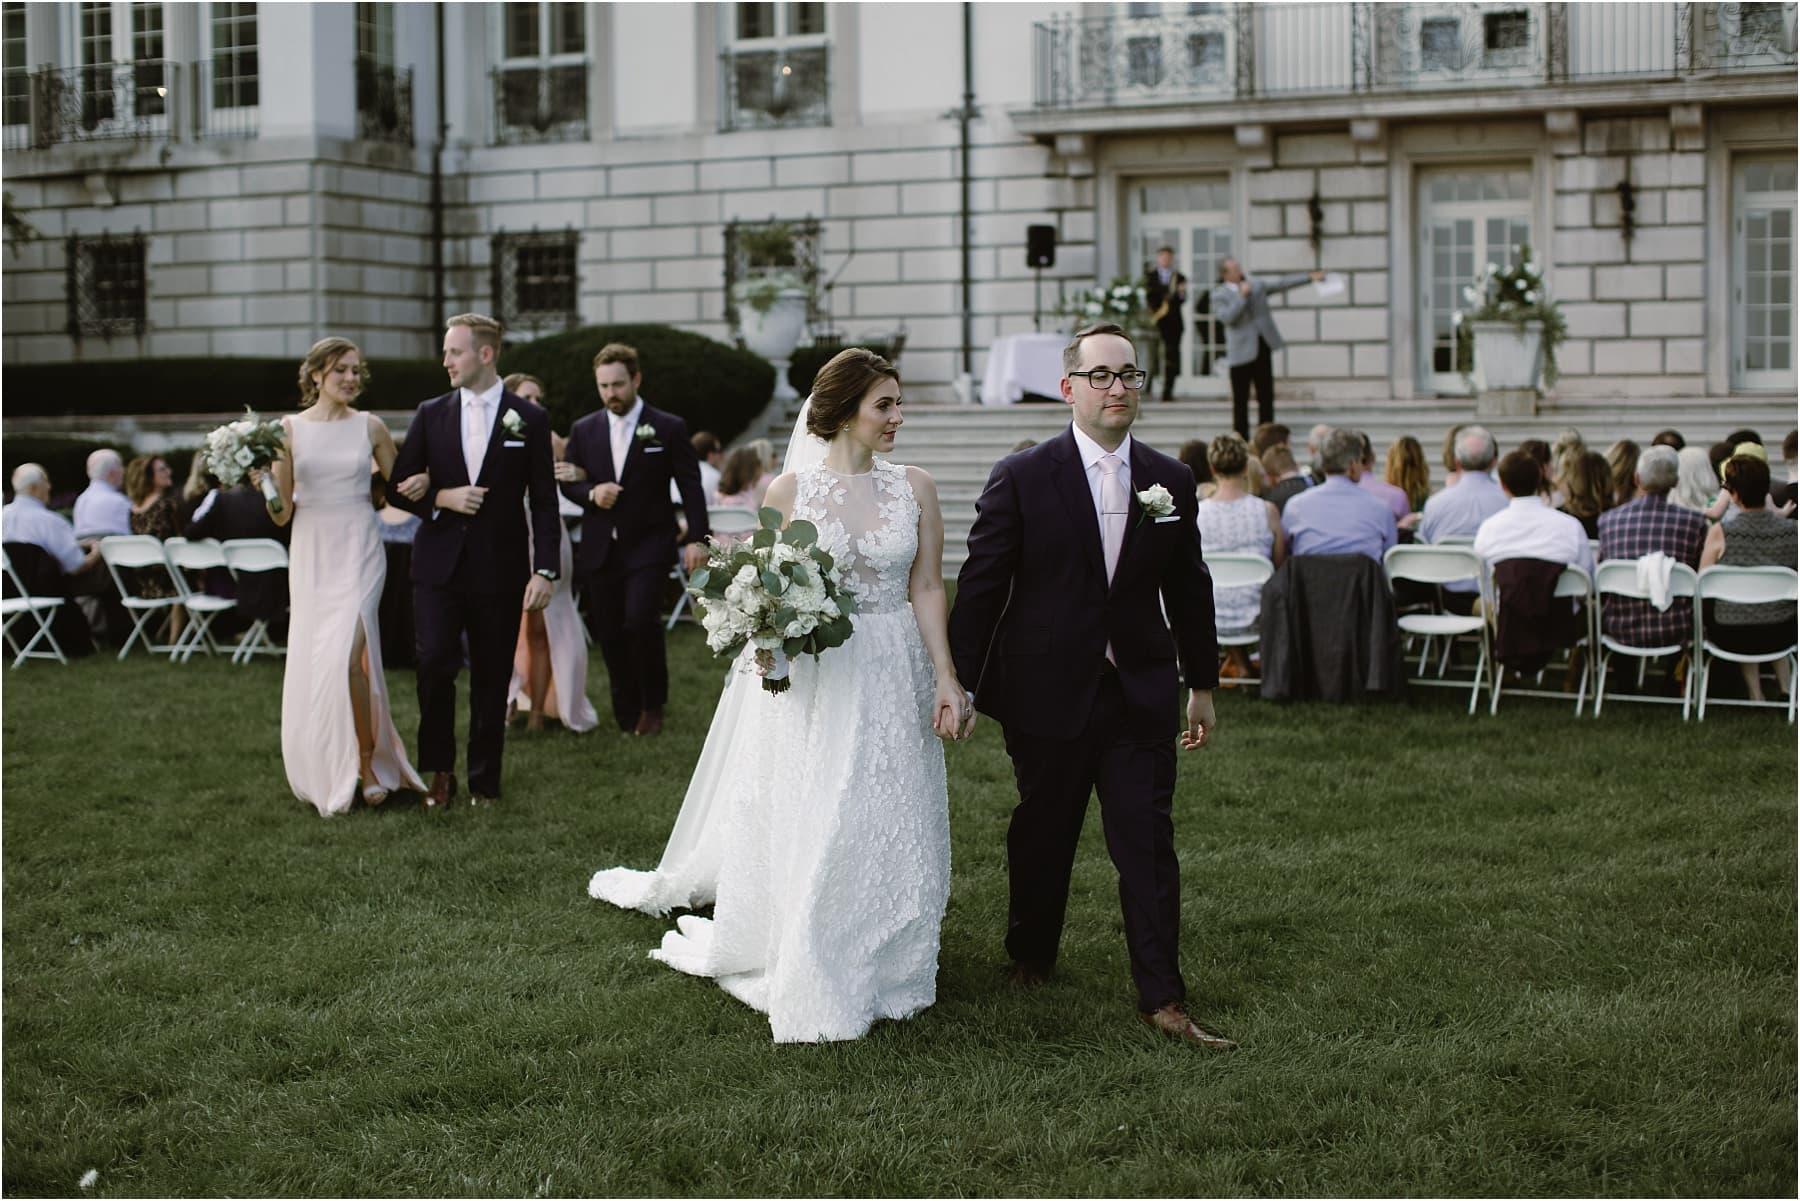 grosse pointe war memorial wedding